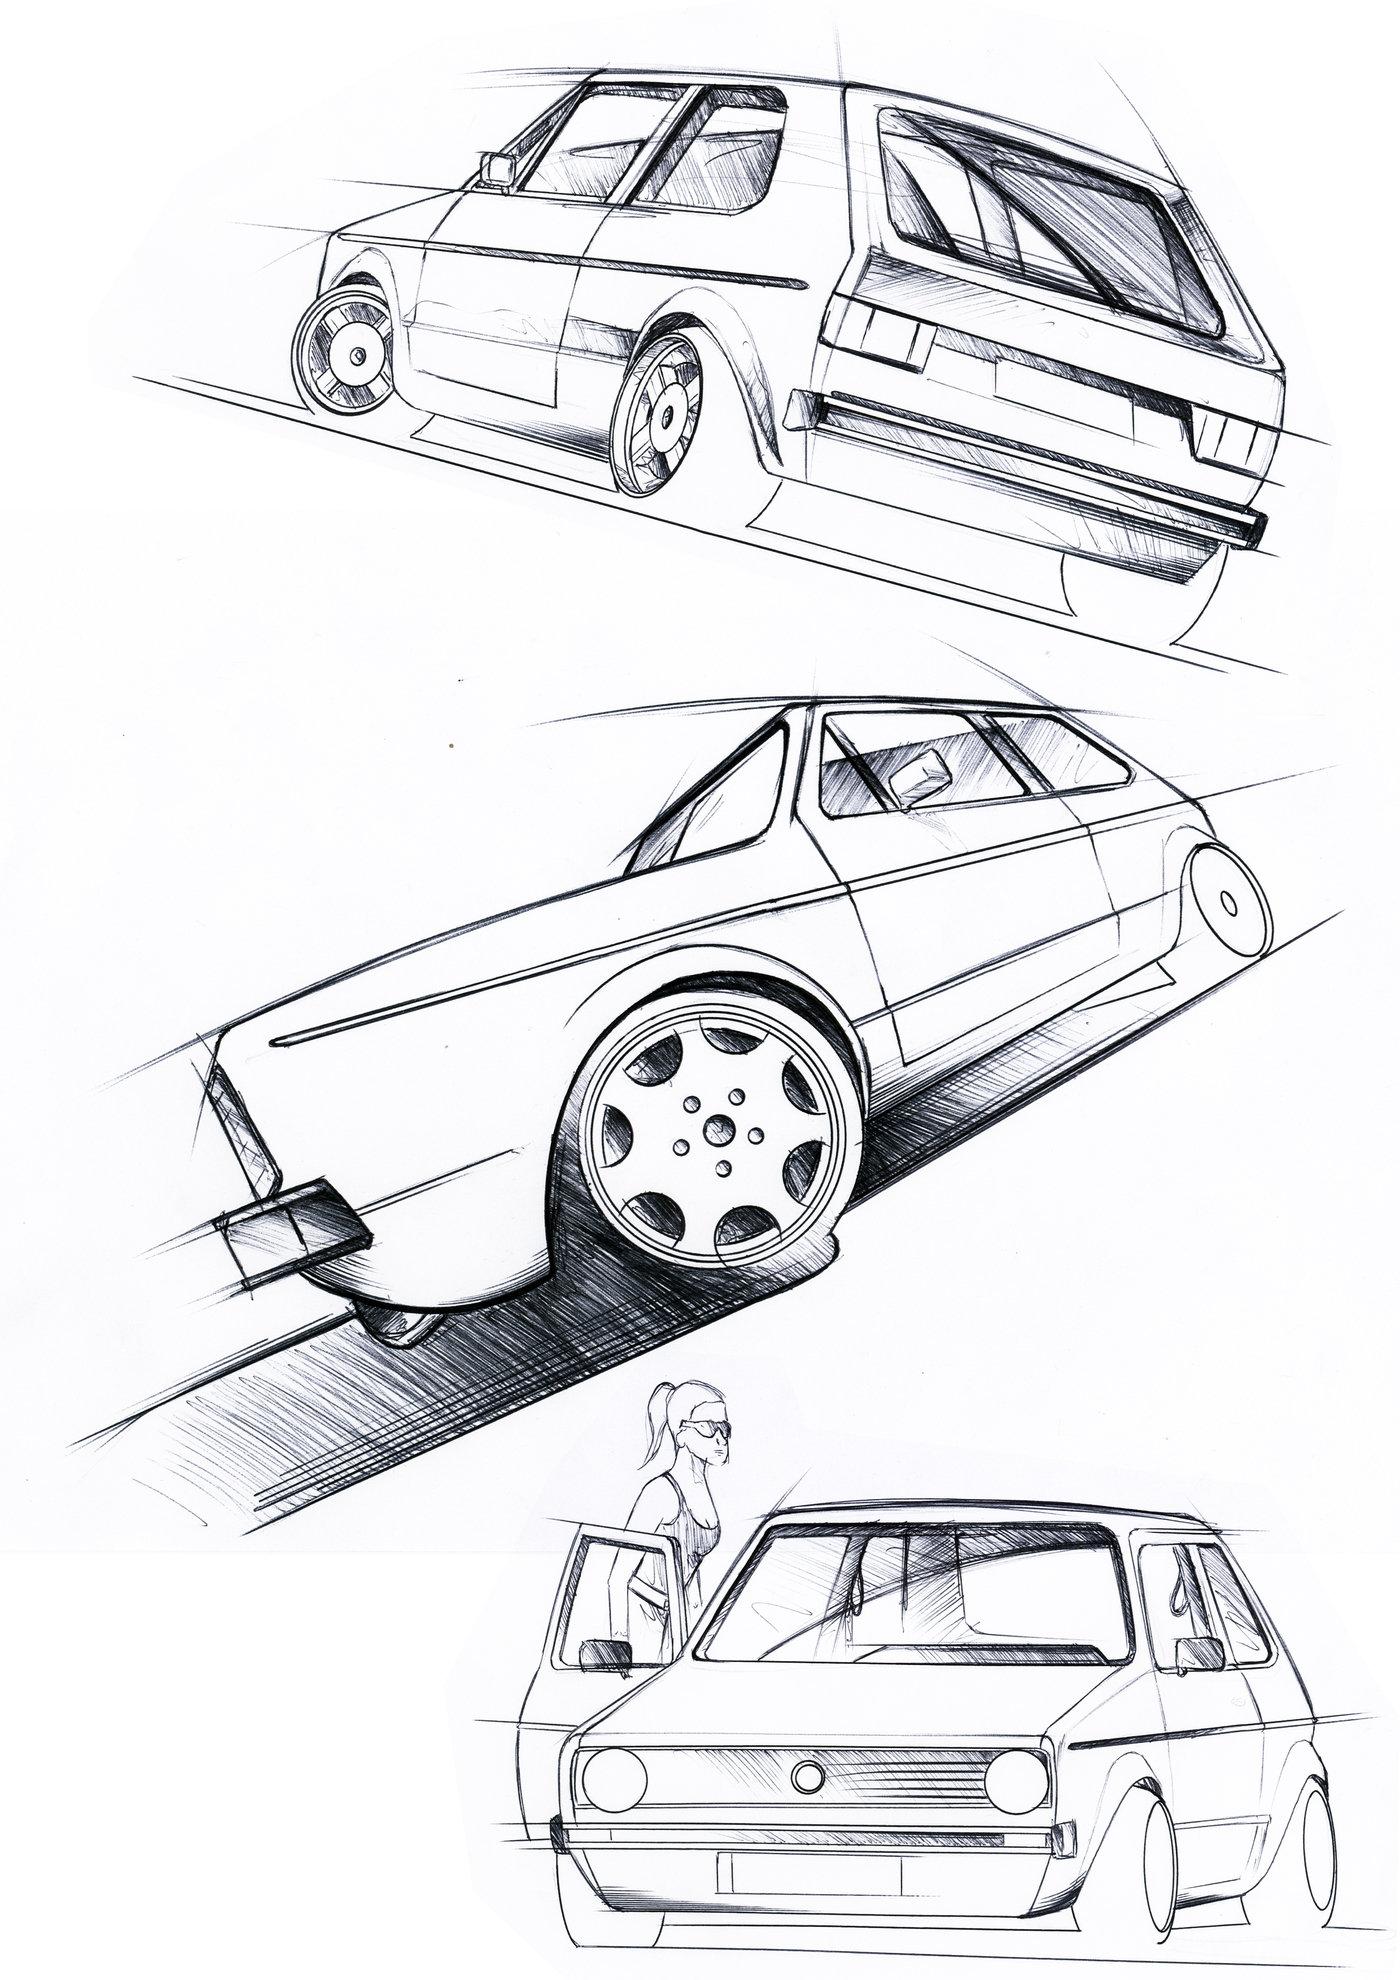 Automotive Illustration By John Bridge At Coroflot